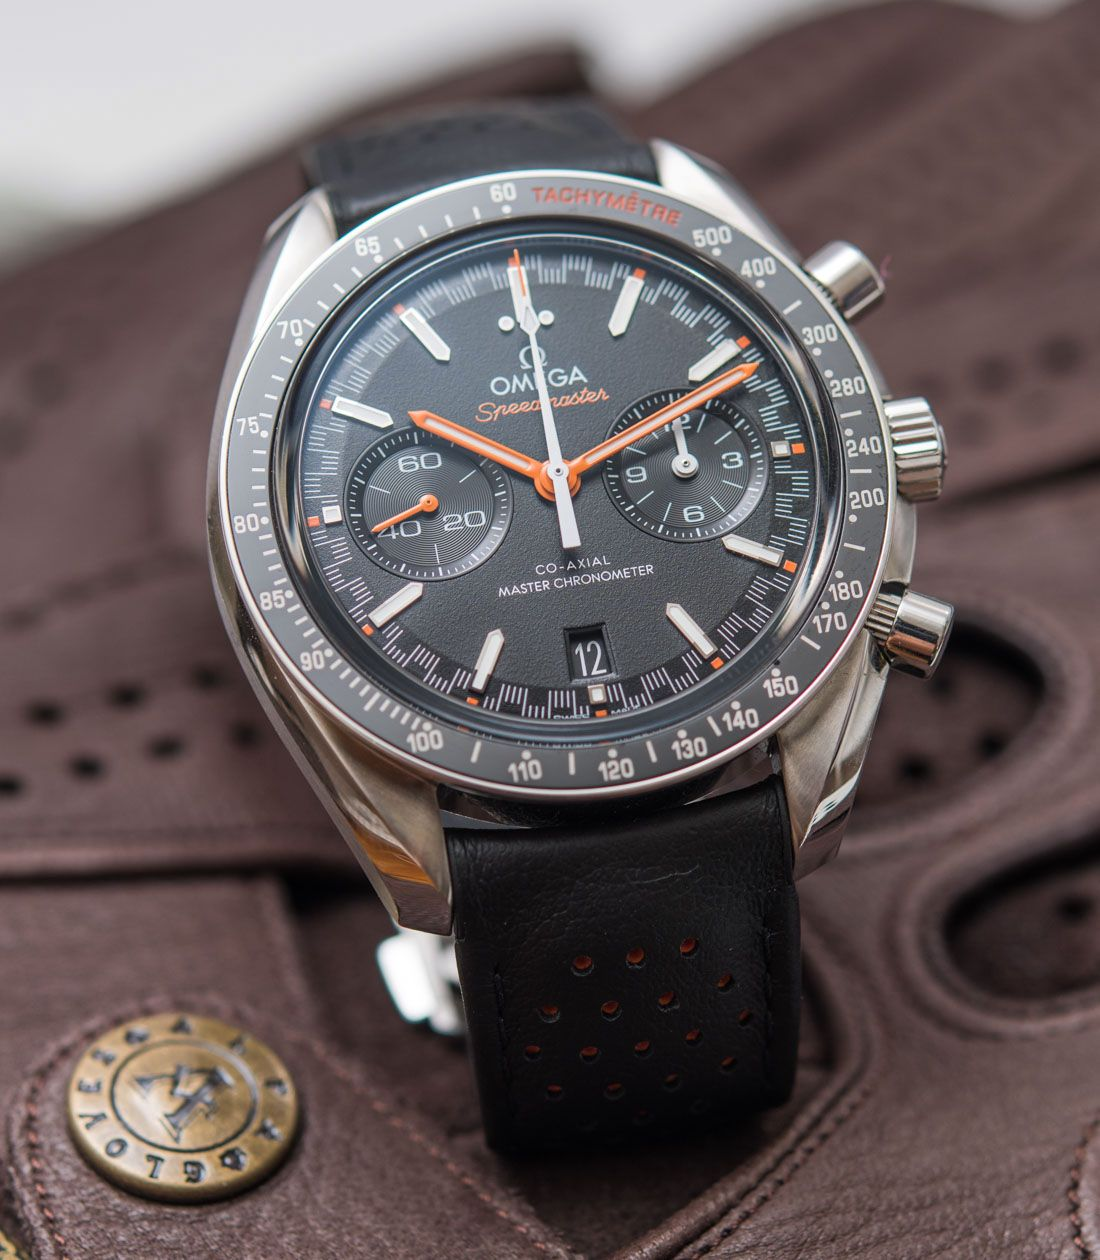 d4ac3798b39 Omega Speedmaster Racing Master Chronometer Watch Review